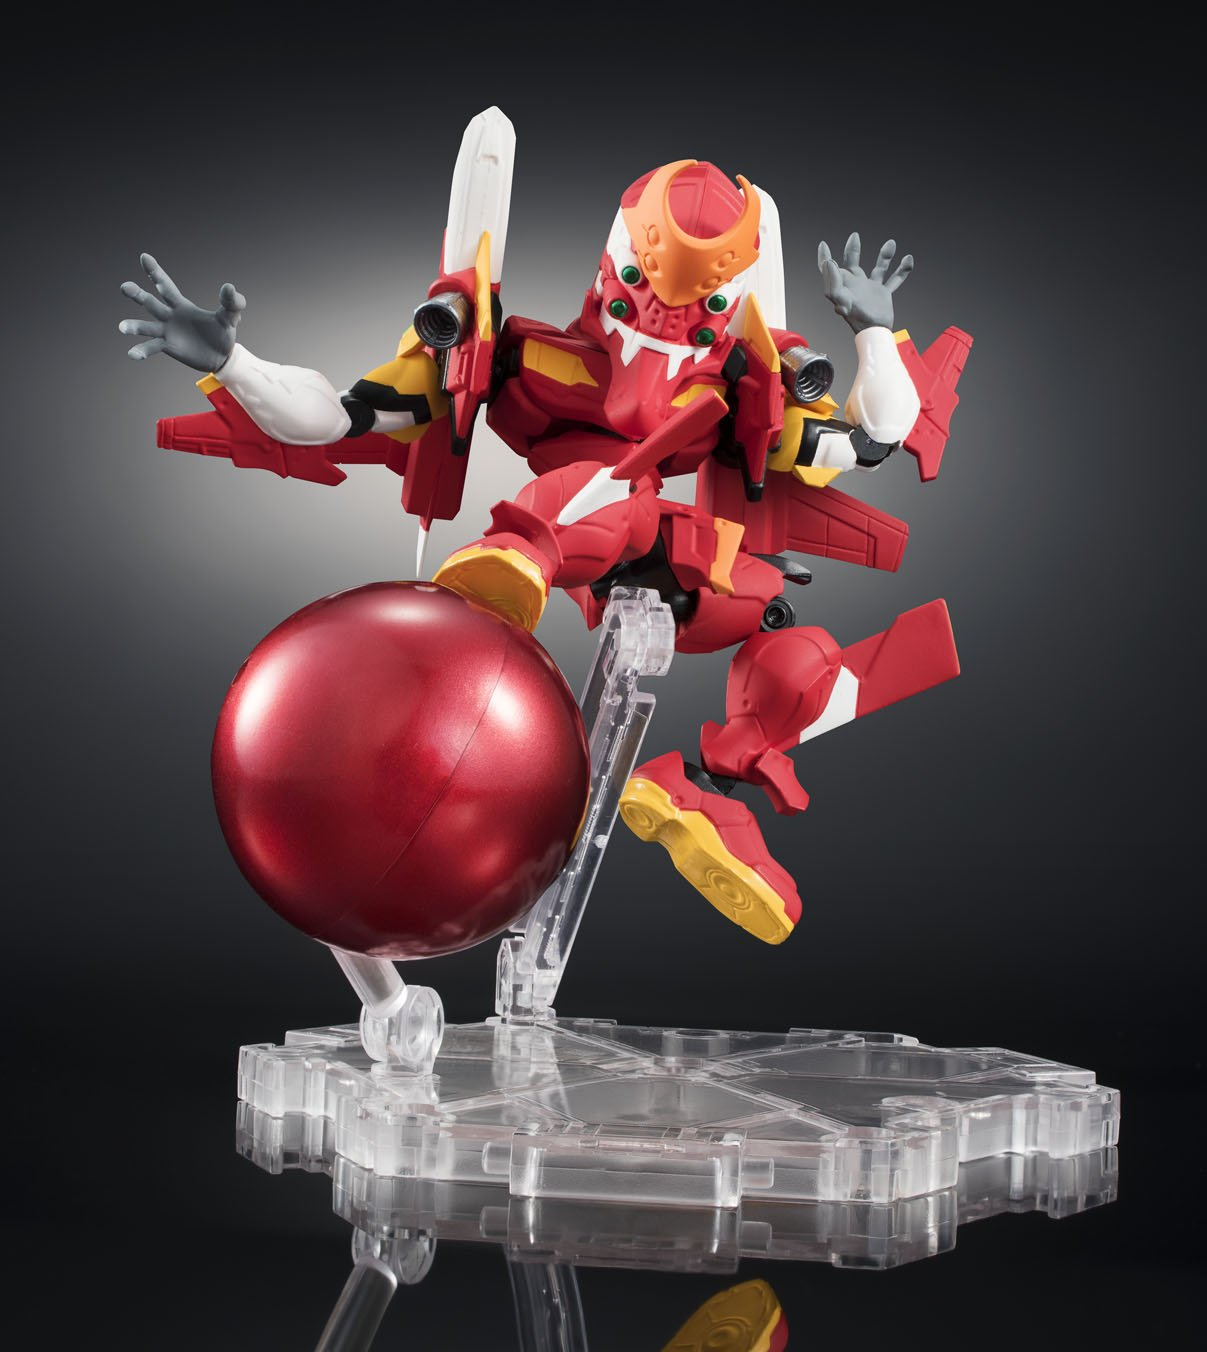 Bandai Tamashii Nations Nxedge Style Eva Unit-02 S-Type Equipment Evangelion Action Figure Bluefin Distribution Toys BAN16097